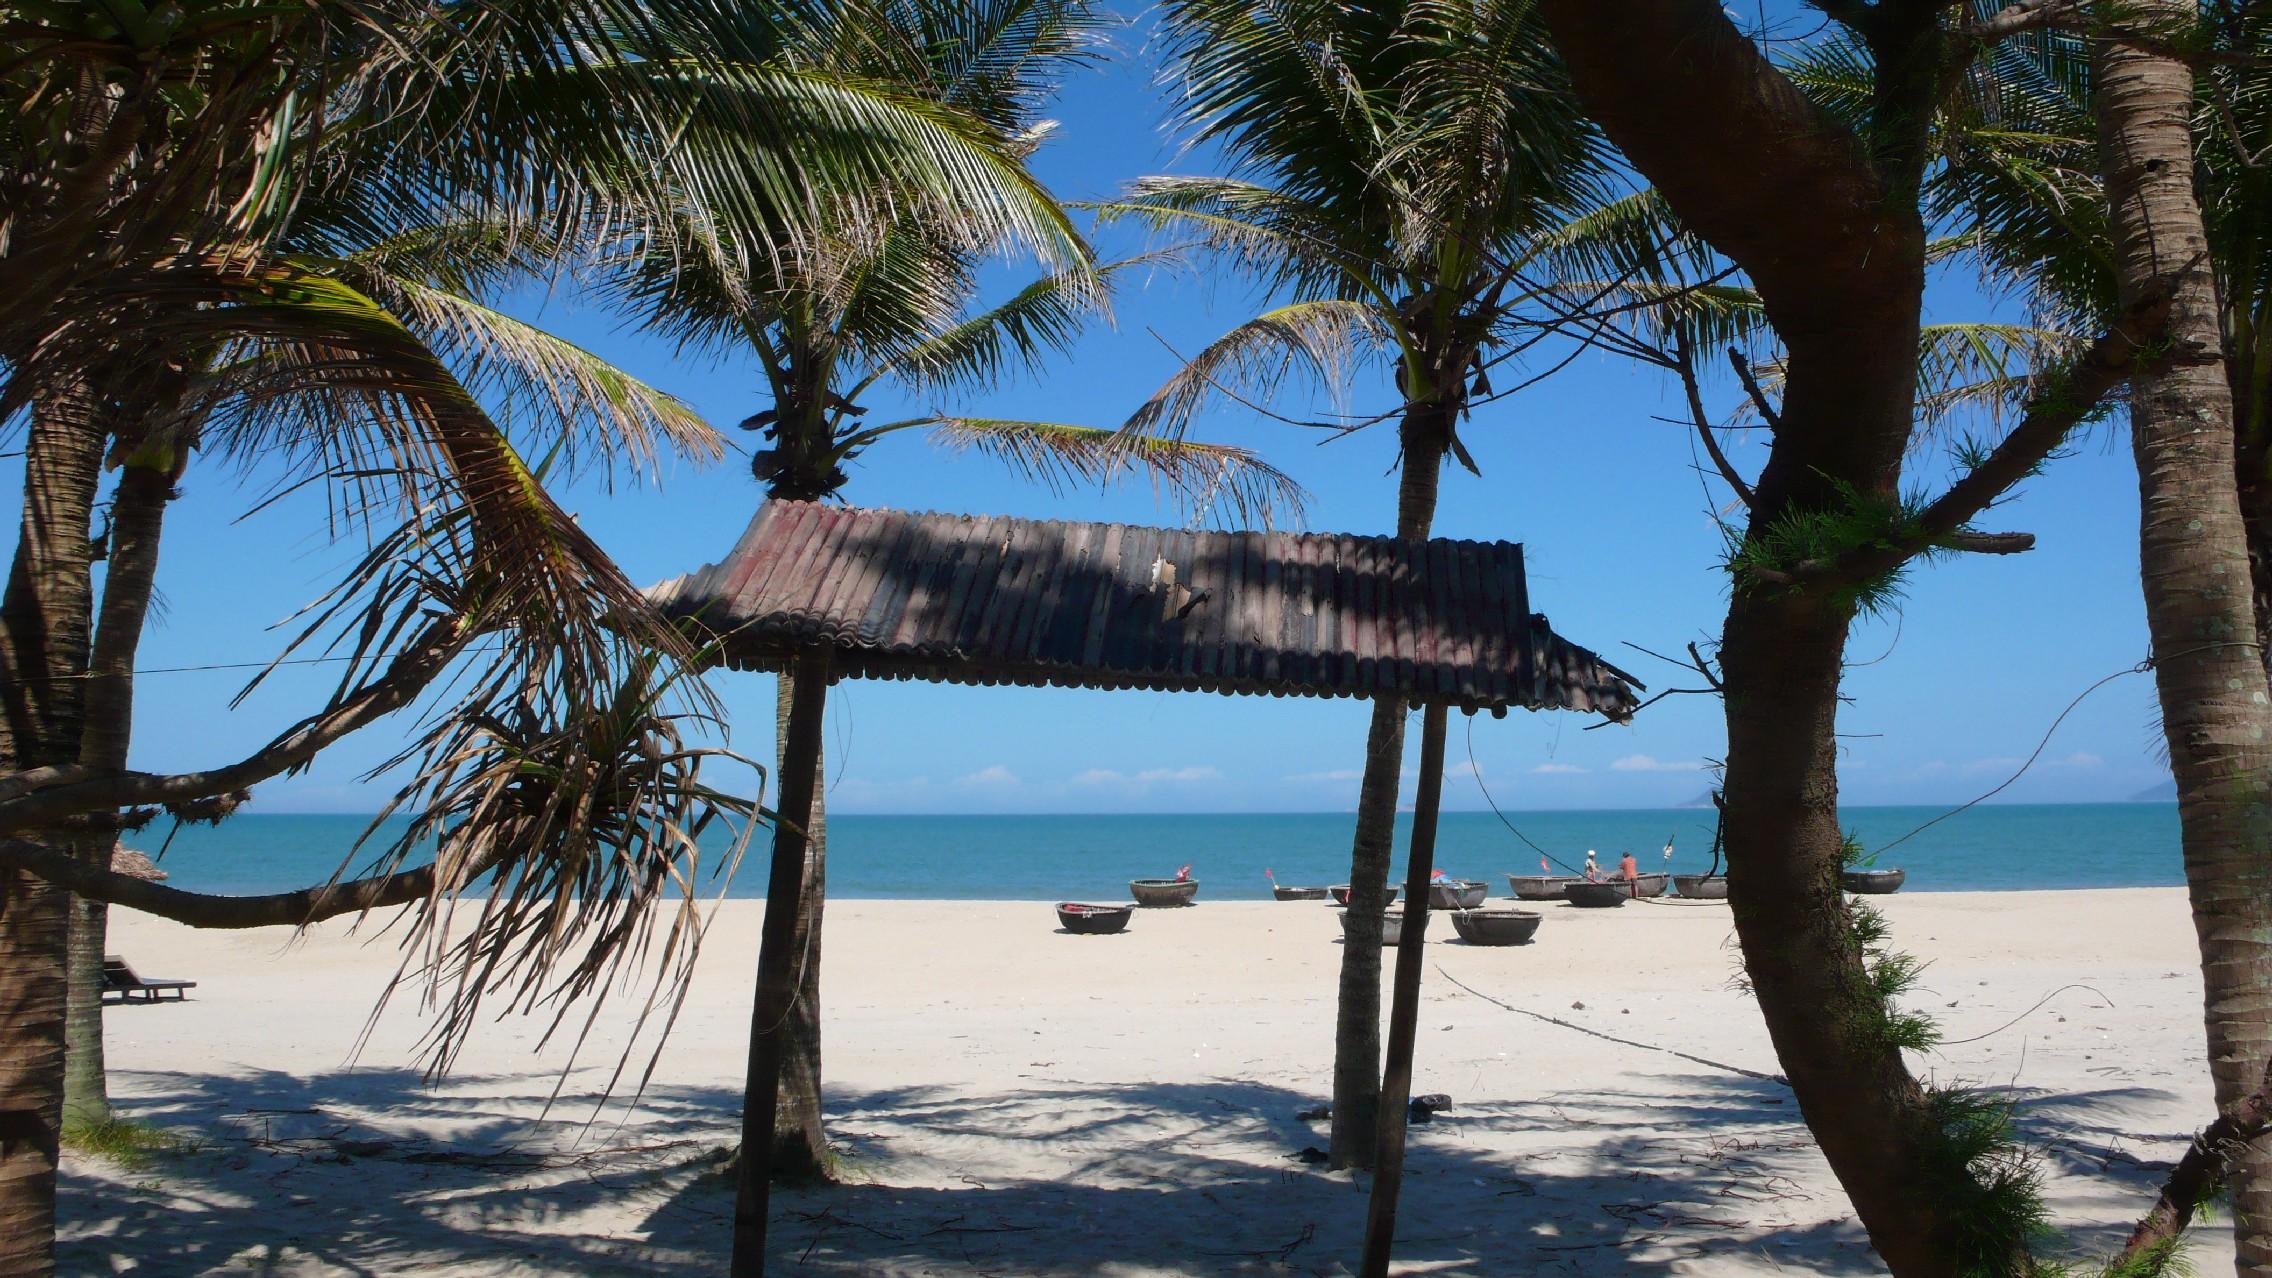 Cua Dai tengerpart, Hoi An, Vietnam